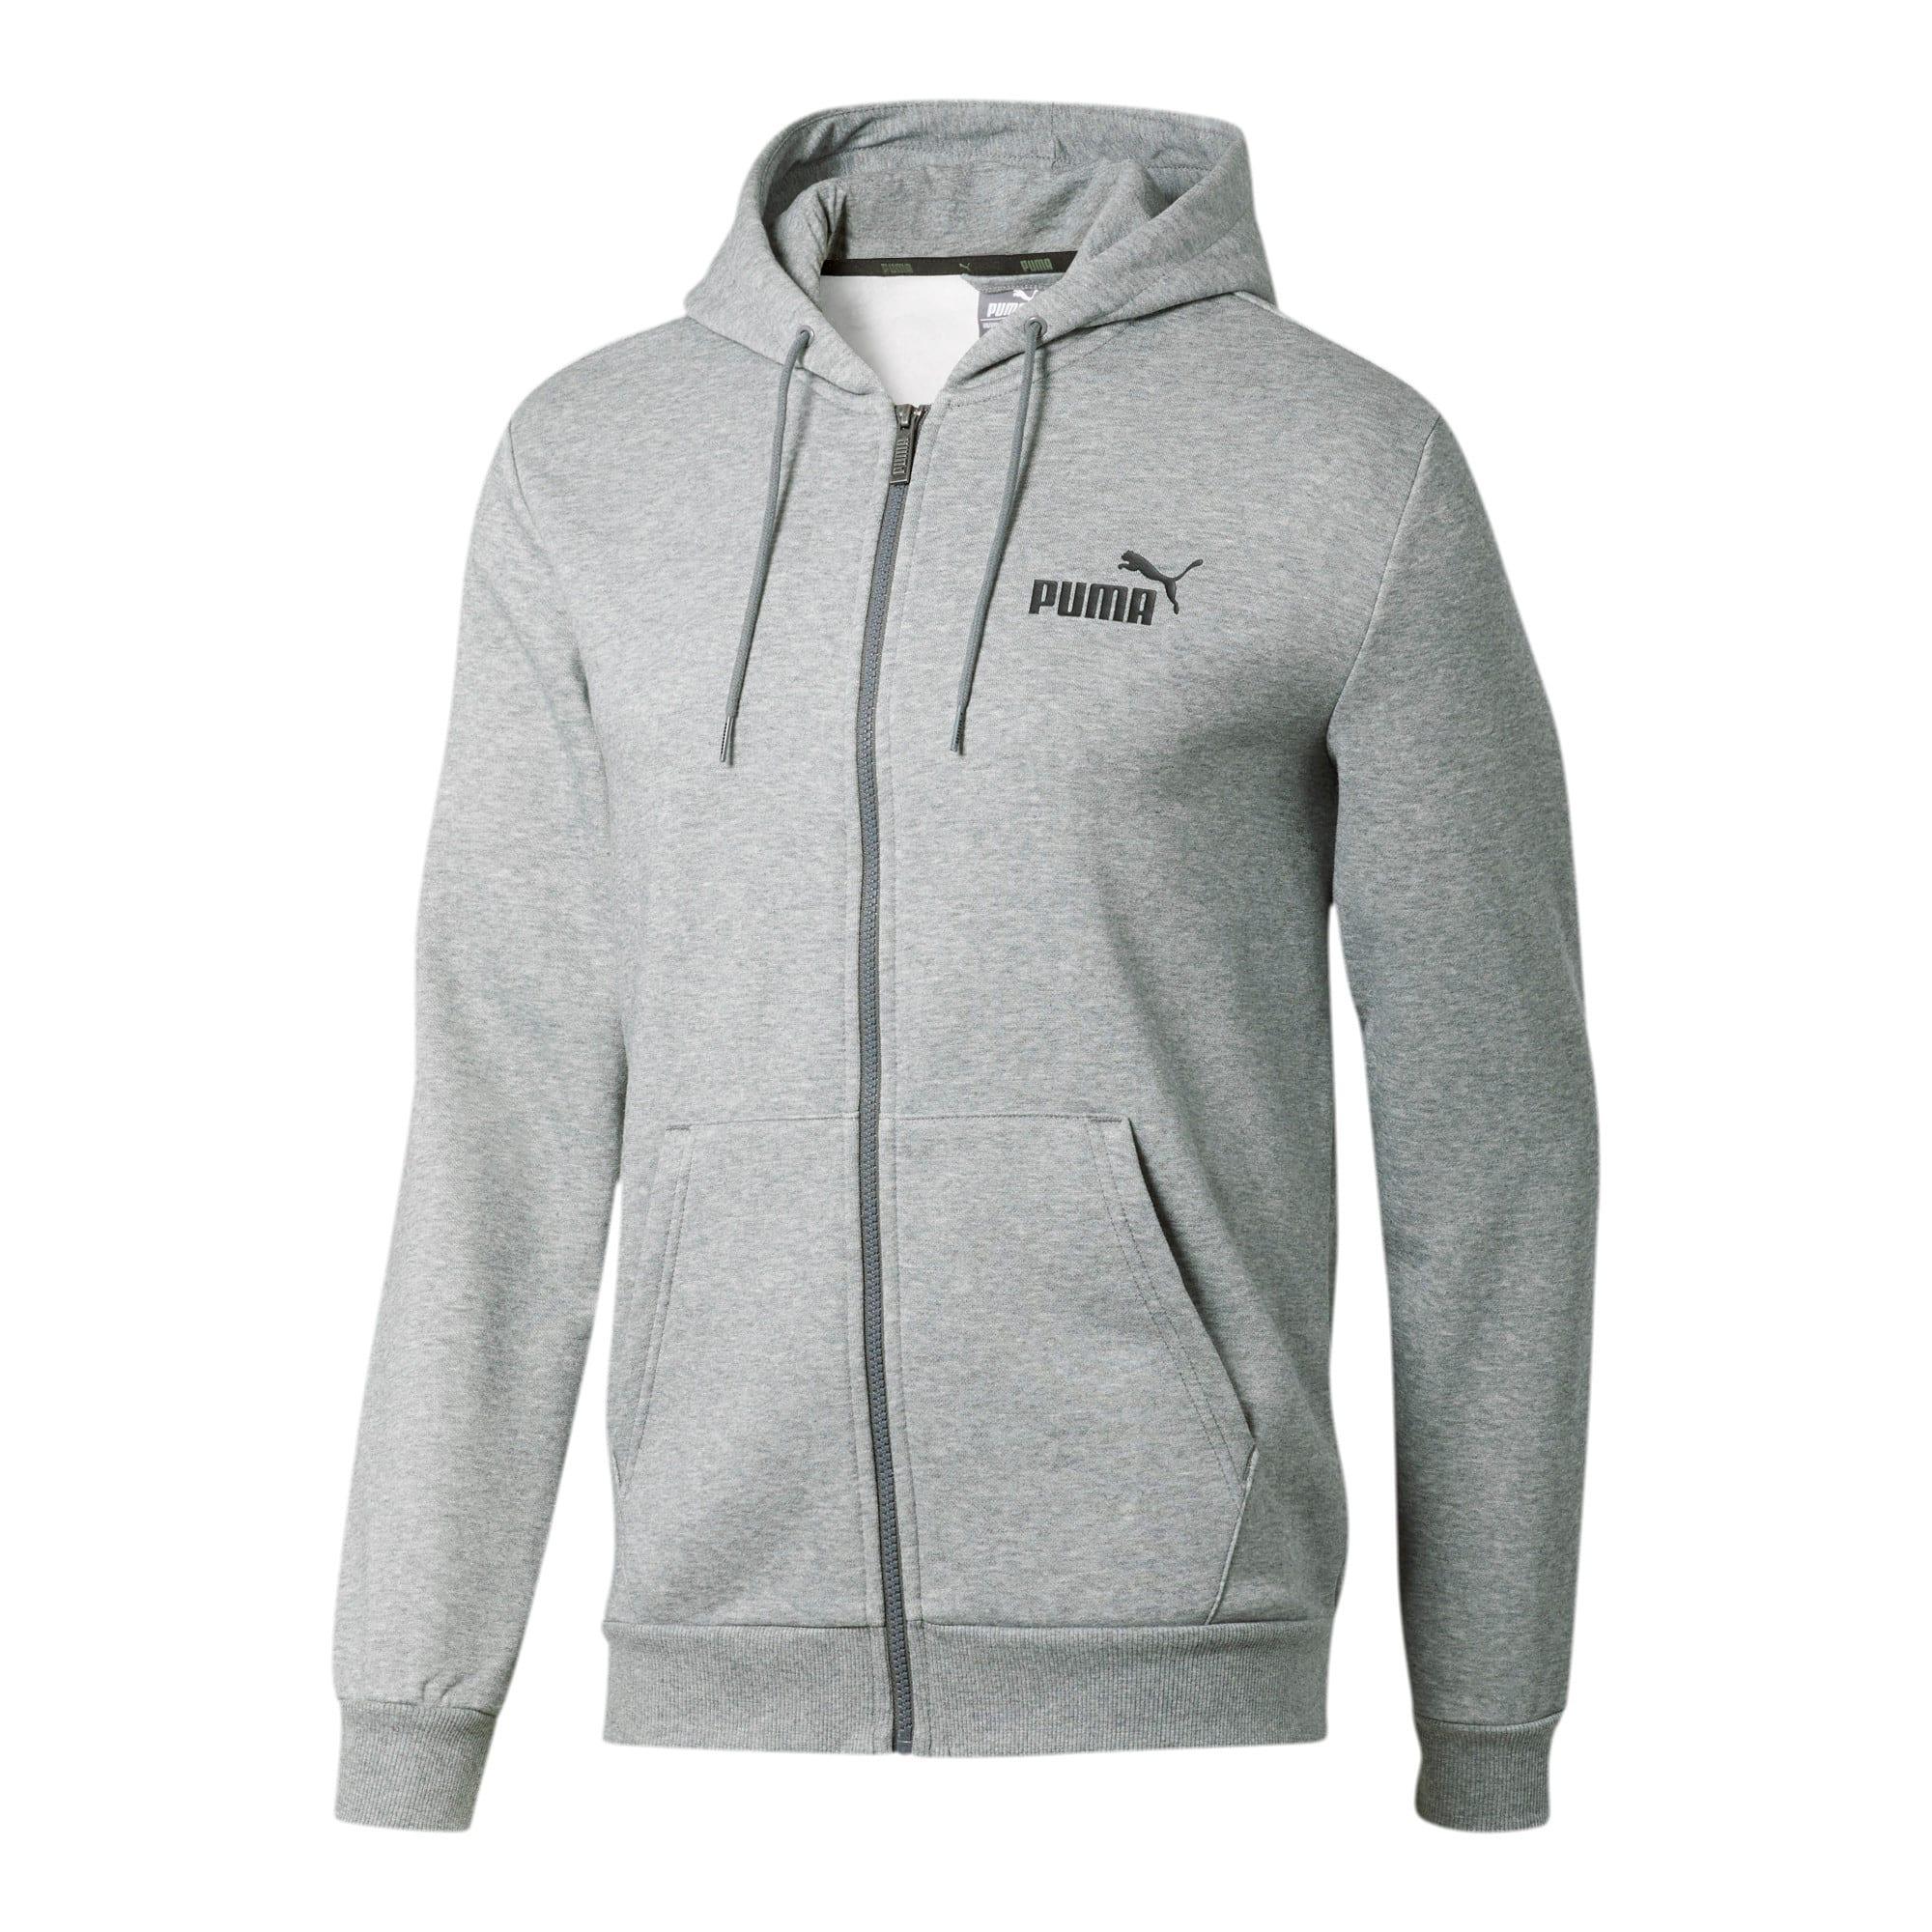 Thumbnail 2 of Essentials Men's Hooded Fleece Jacket, Medium Gray Heather, medium